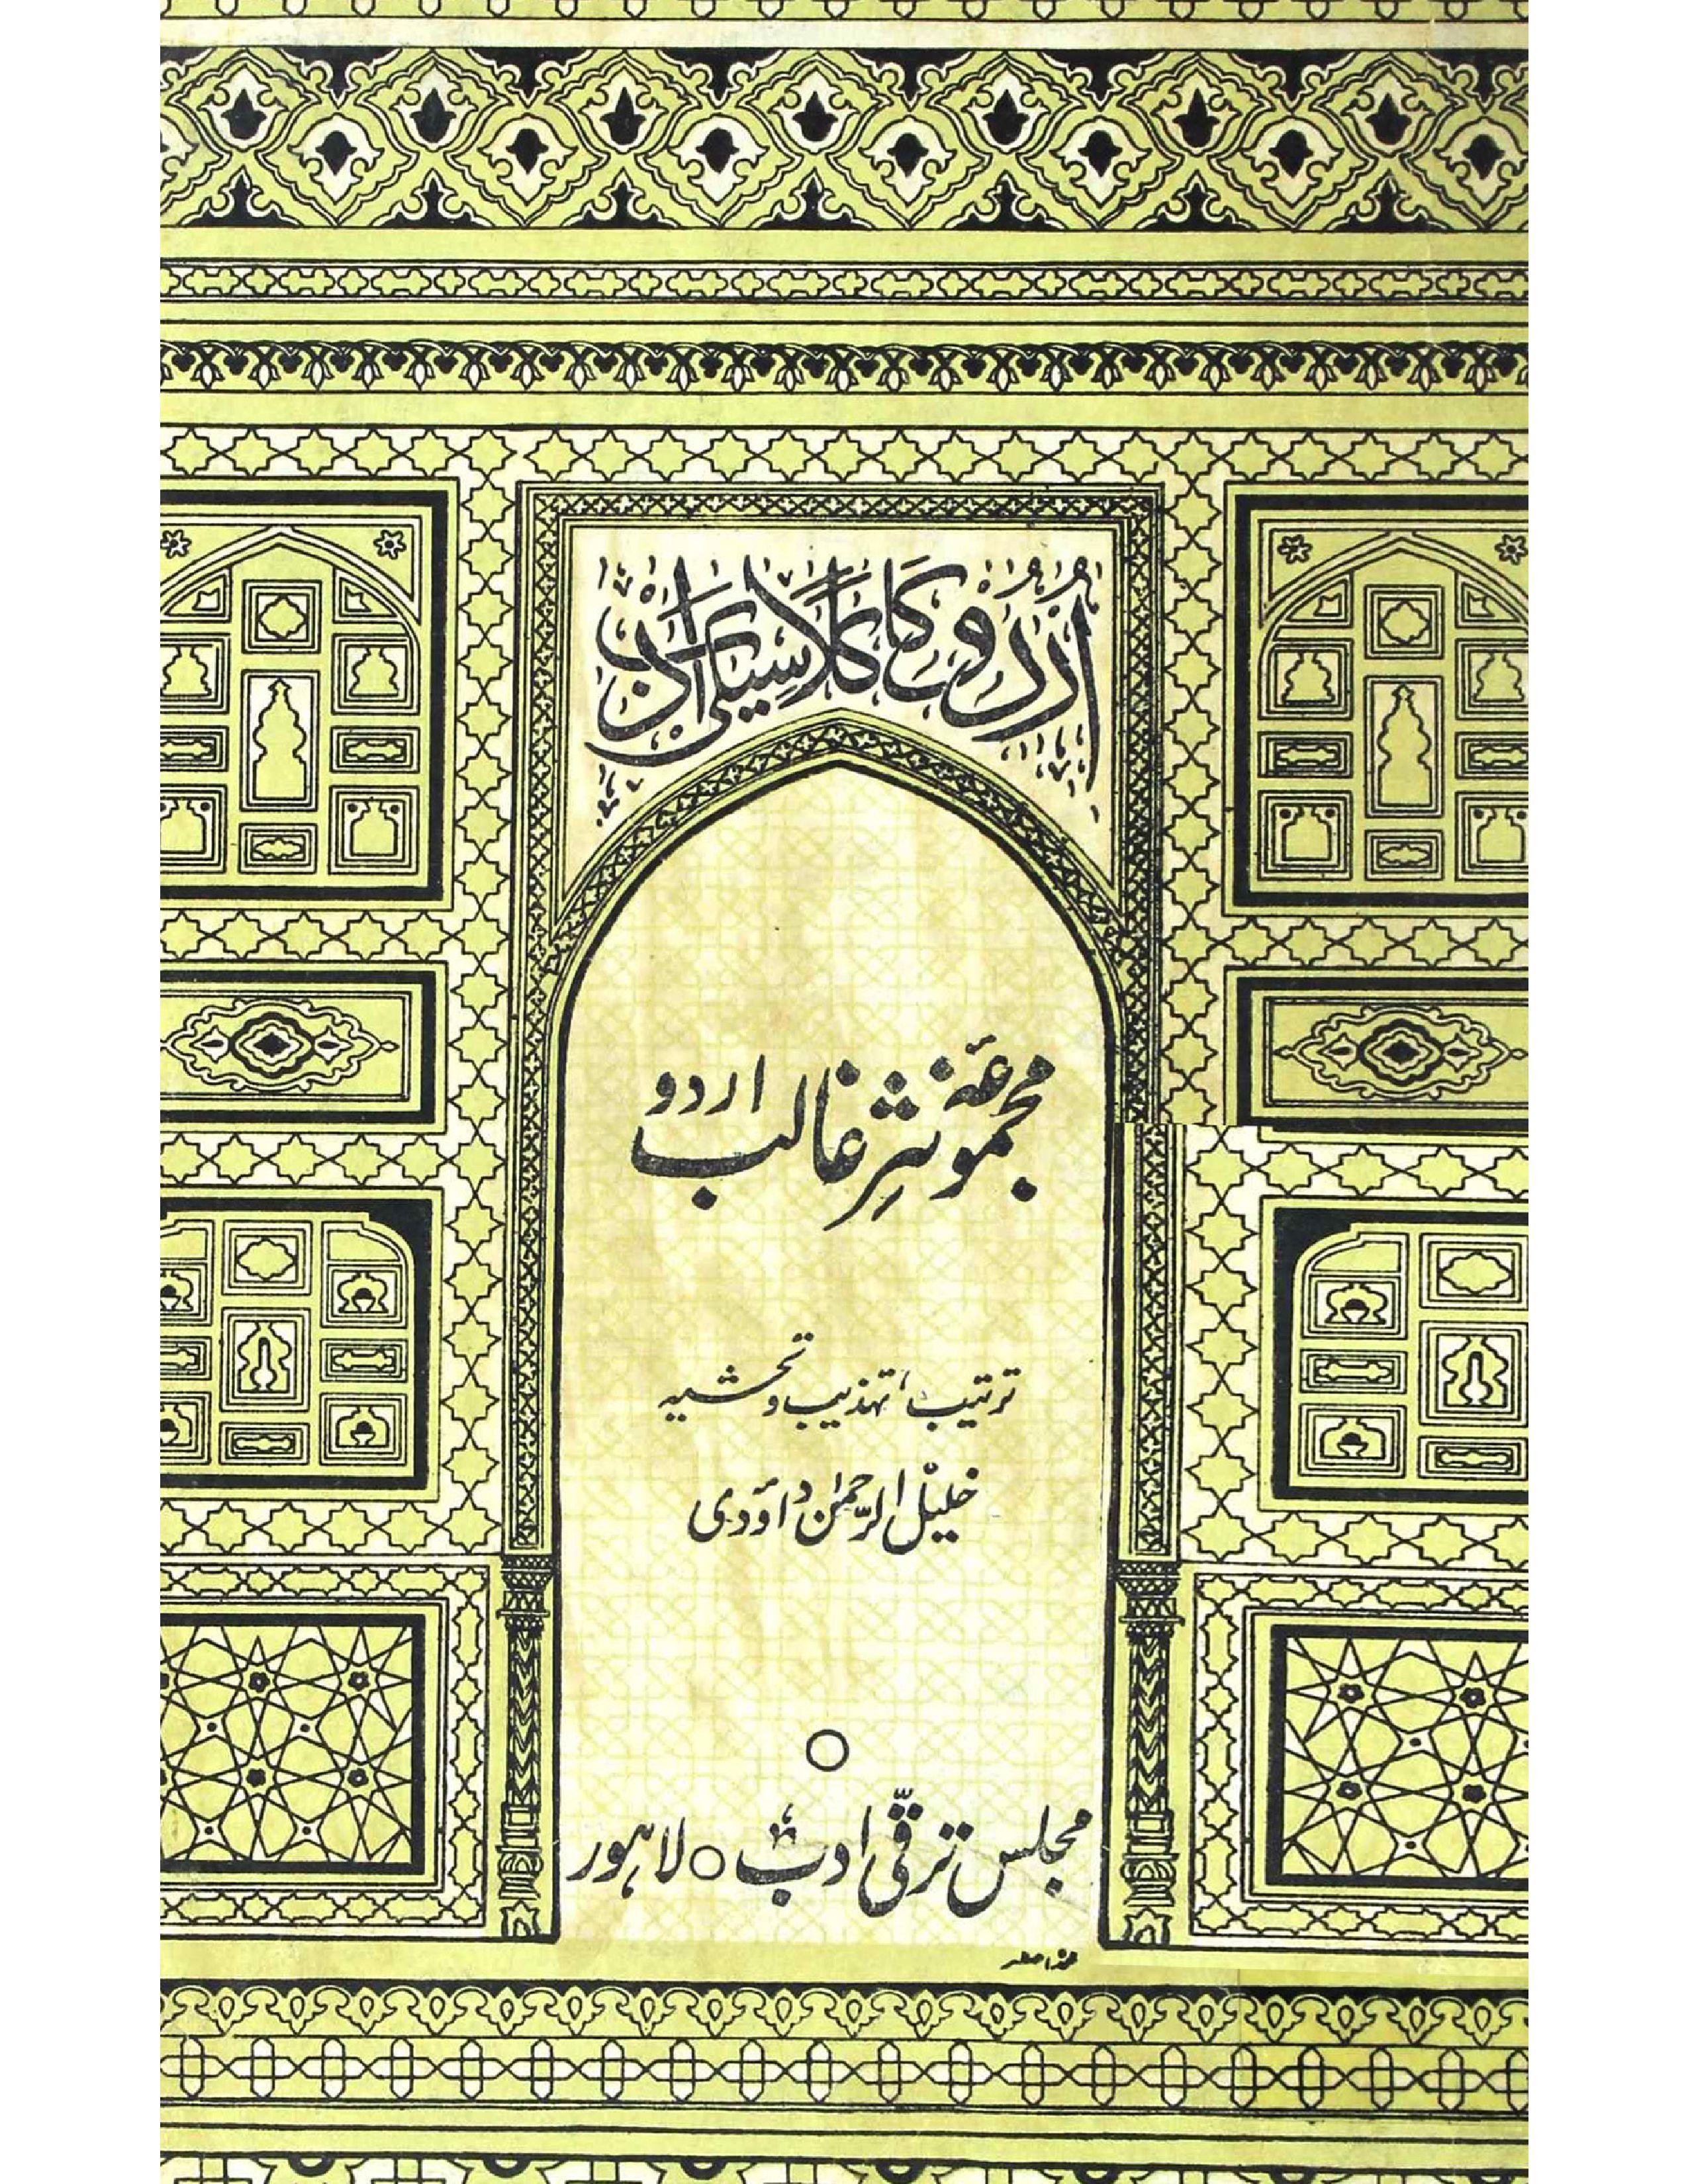 Majmua Nasr-e-Ghalib Urdu